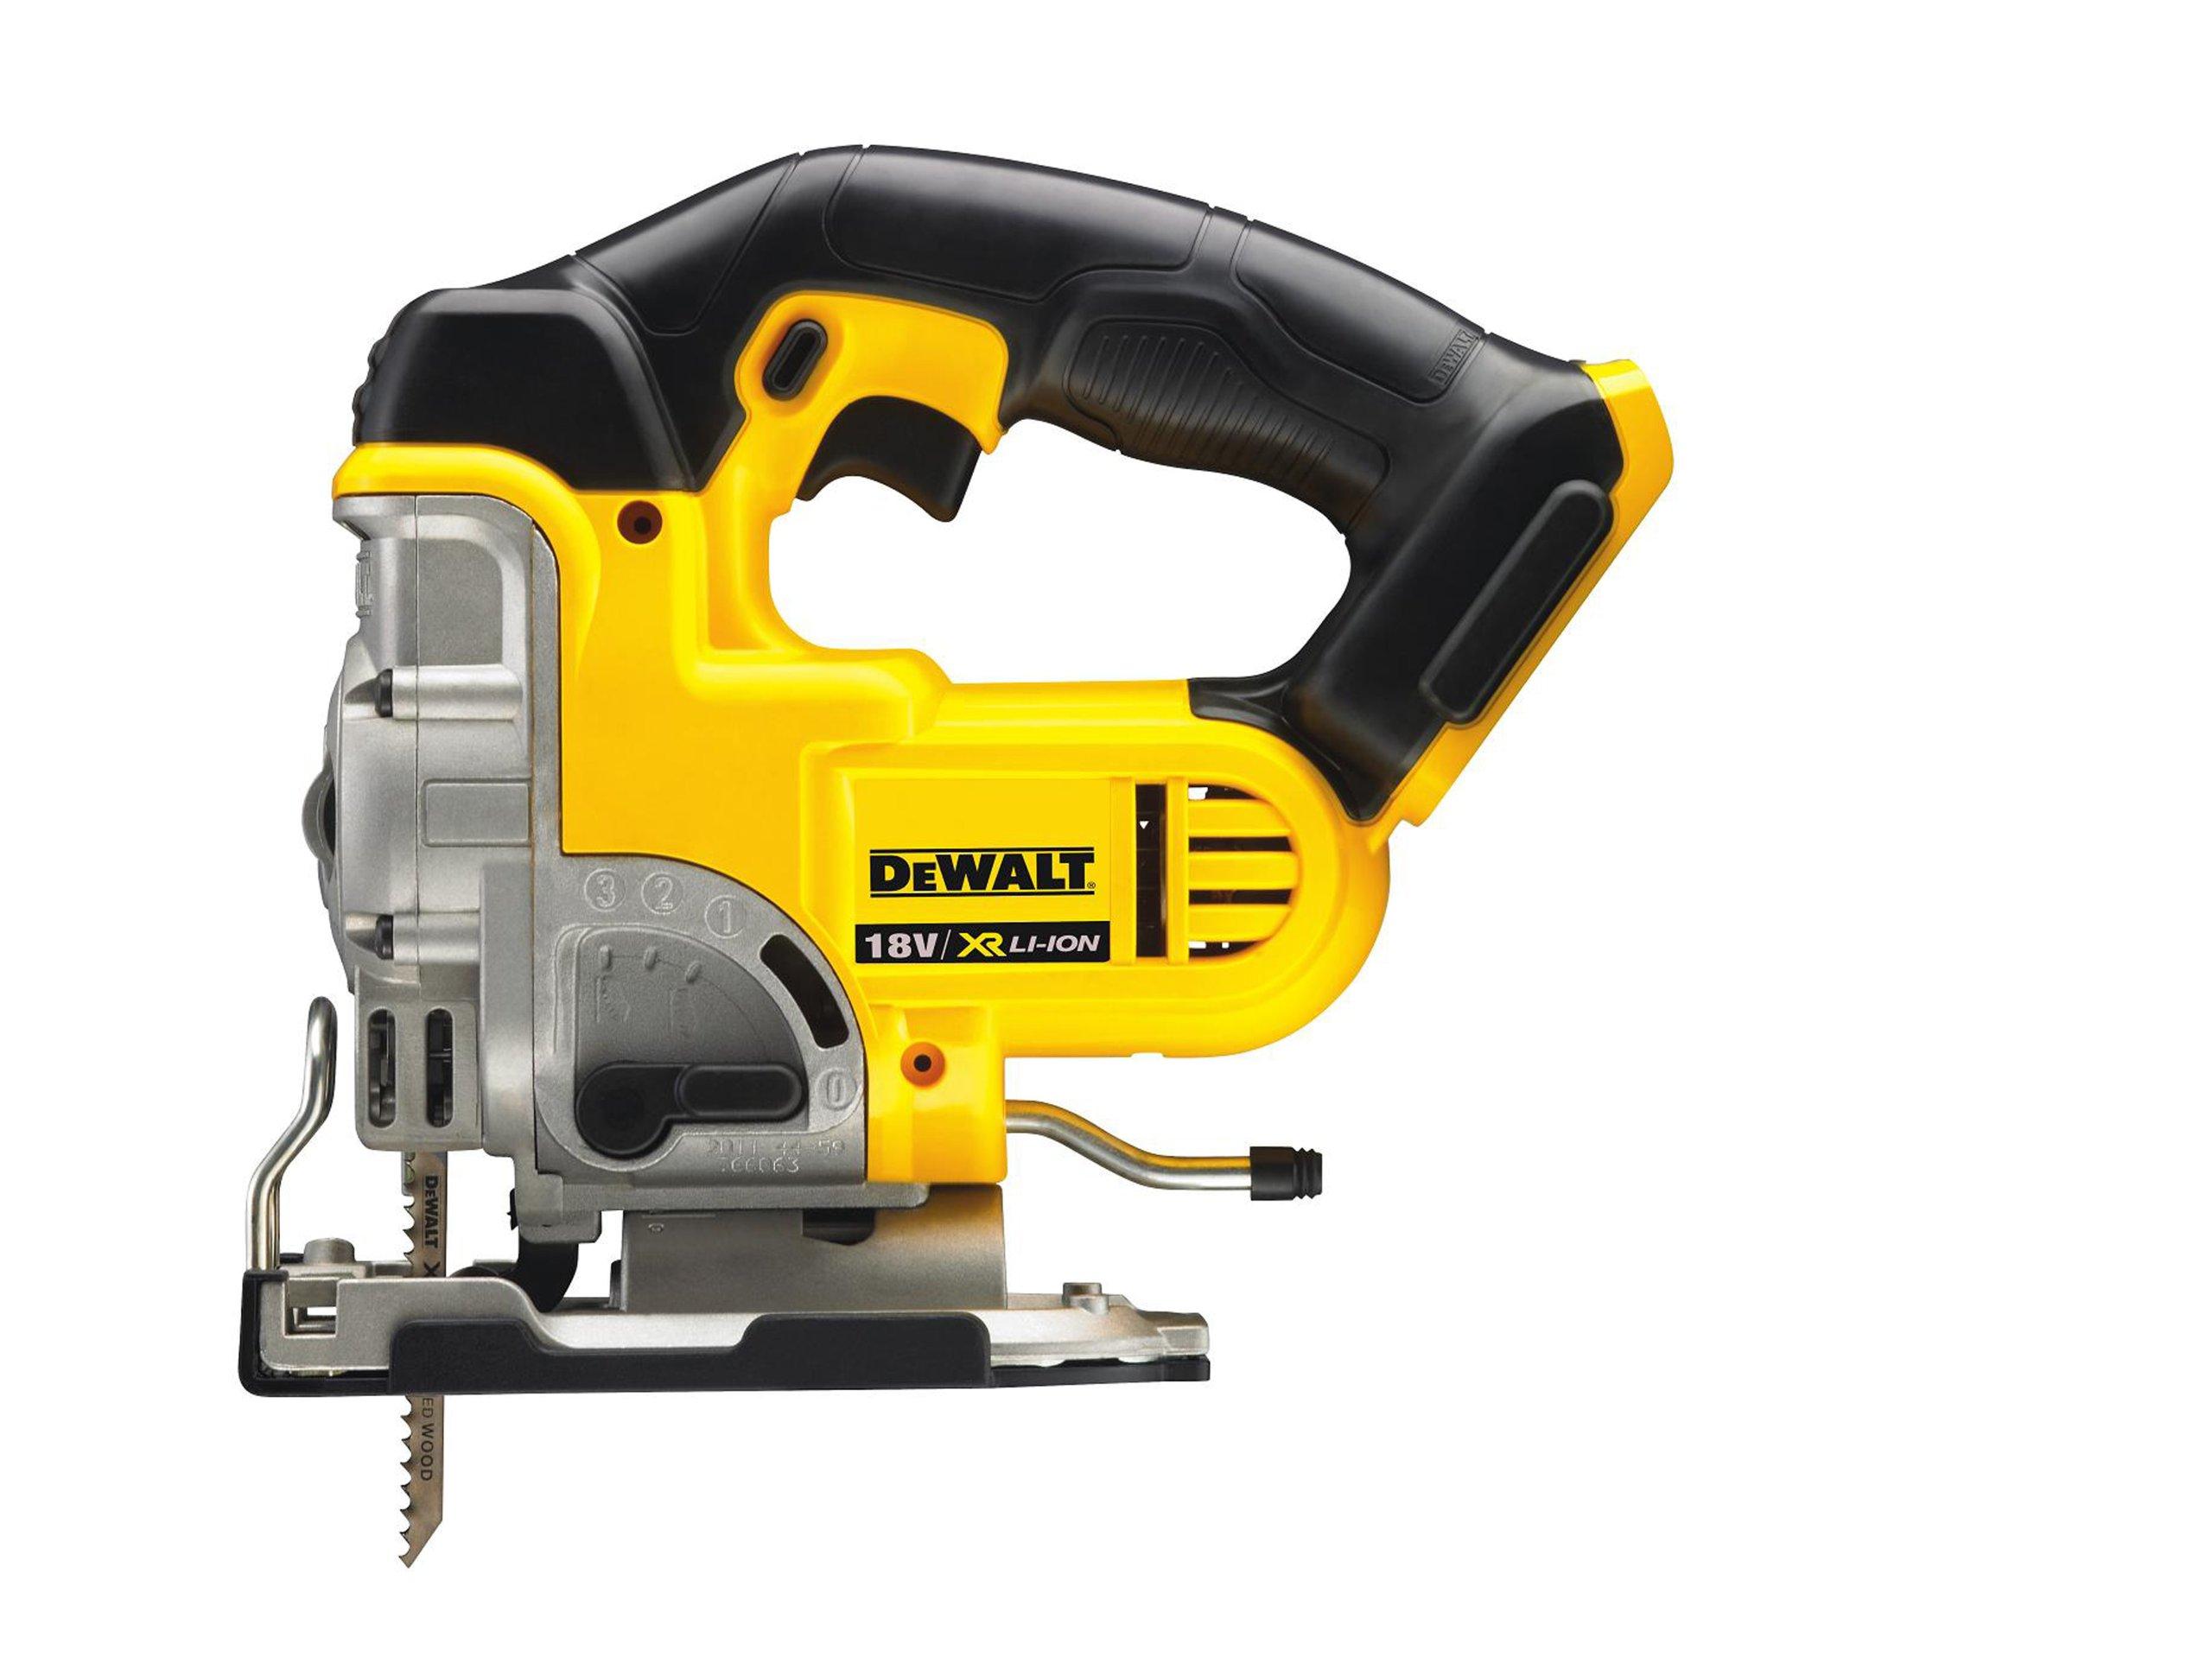 Dewalt Tools - DCS331N XR Premium Cordless Jigsaw 18 Volt Bare Unit